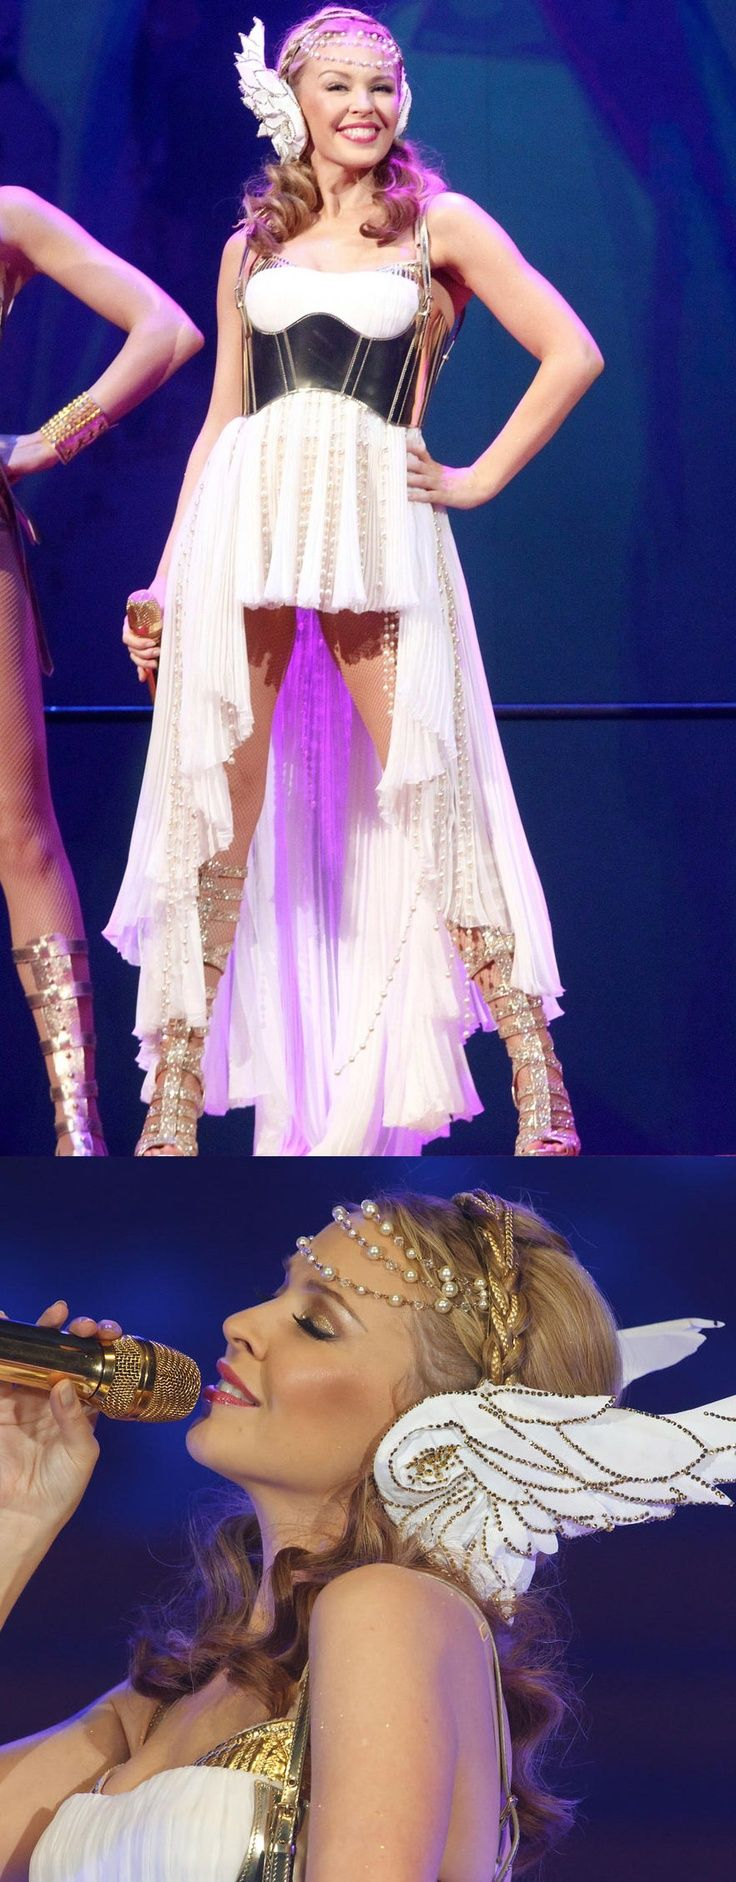 Aphrodite Costume Ideas | Greek Goddess Aphrodite Halloween Costume Idea. Kylie Minogue Les ...